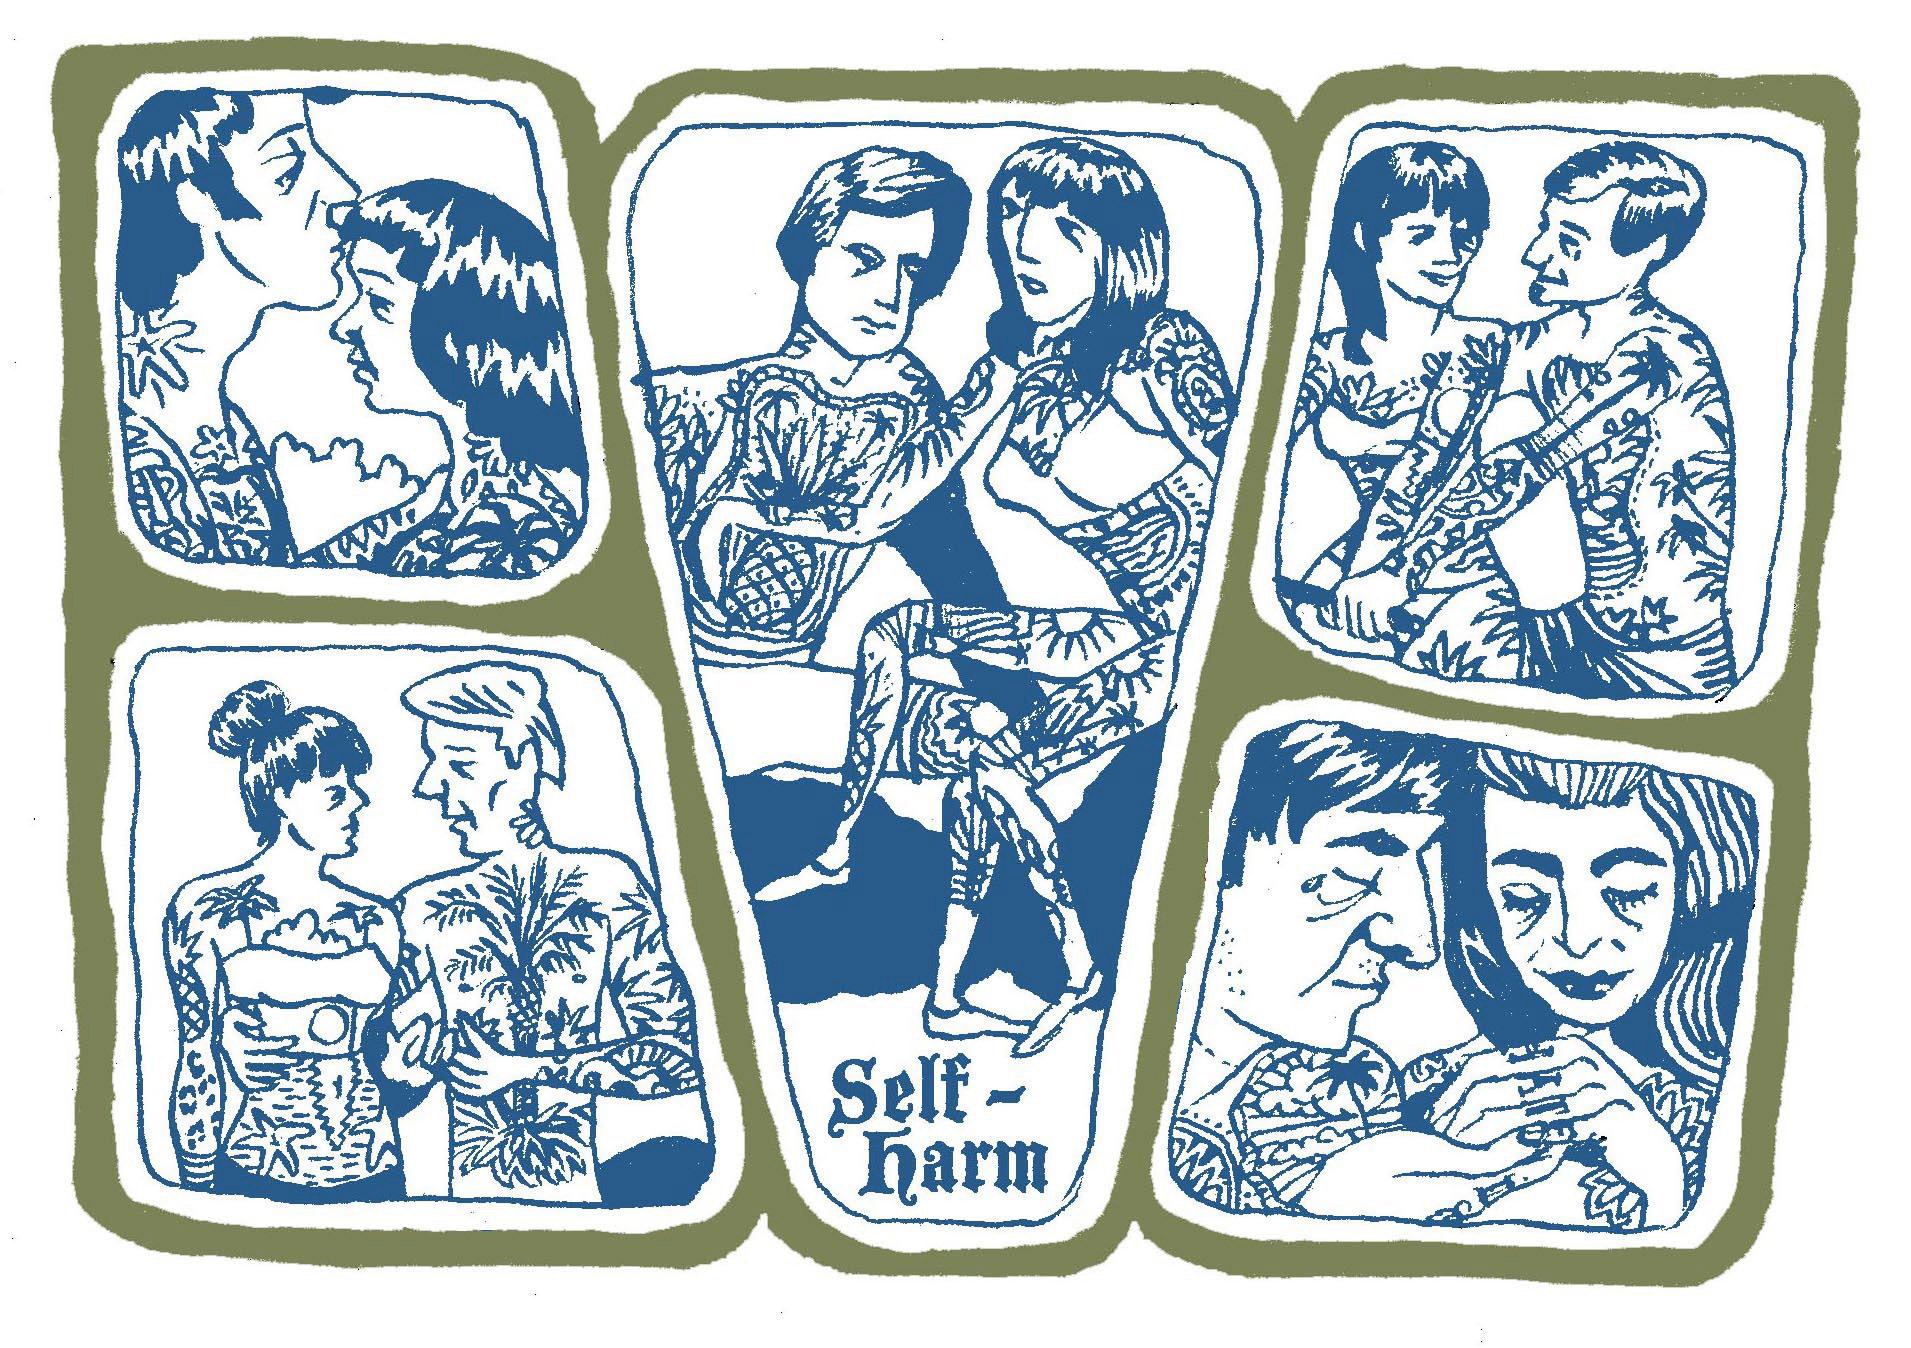 'Self Harm'